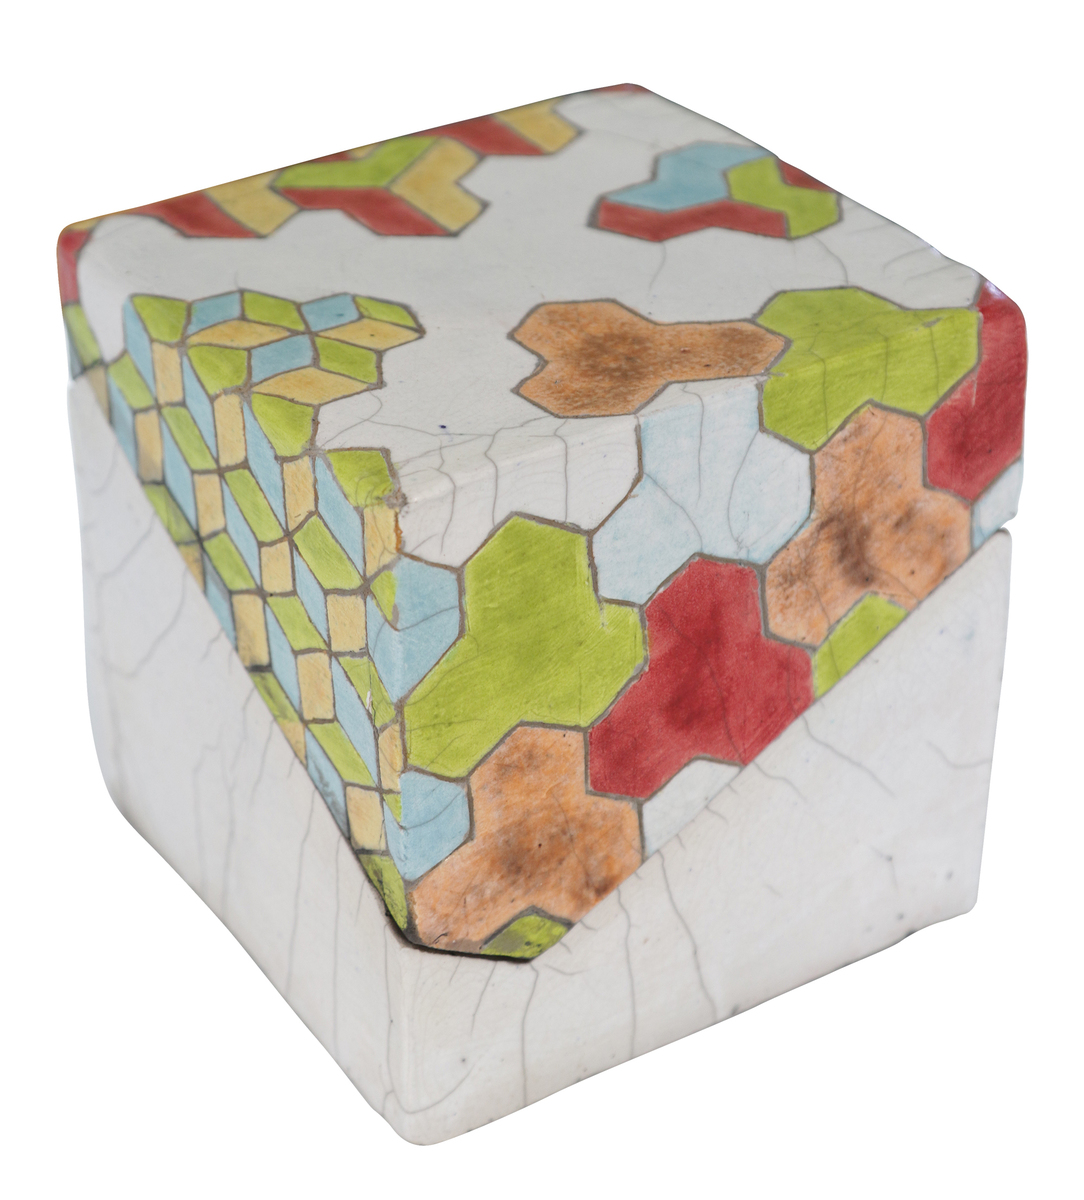 Tessellated Lidded Box